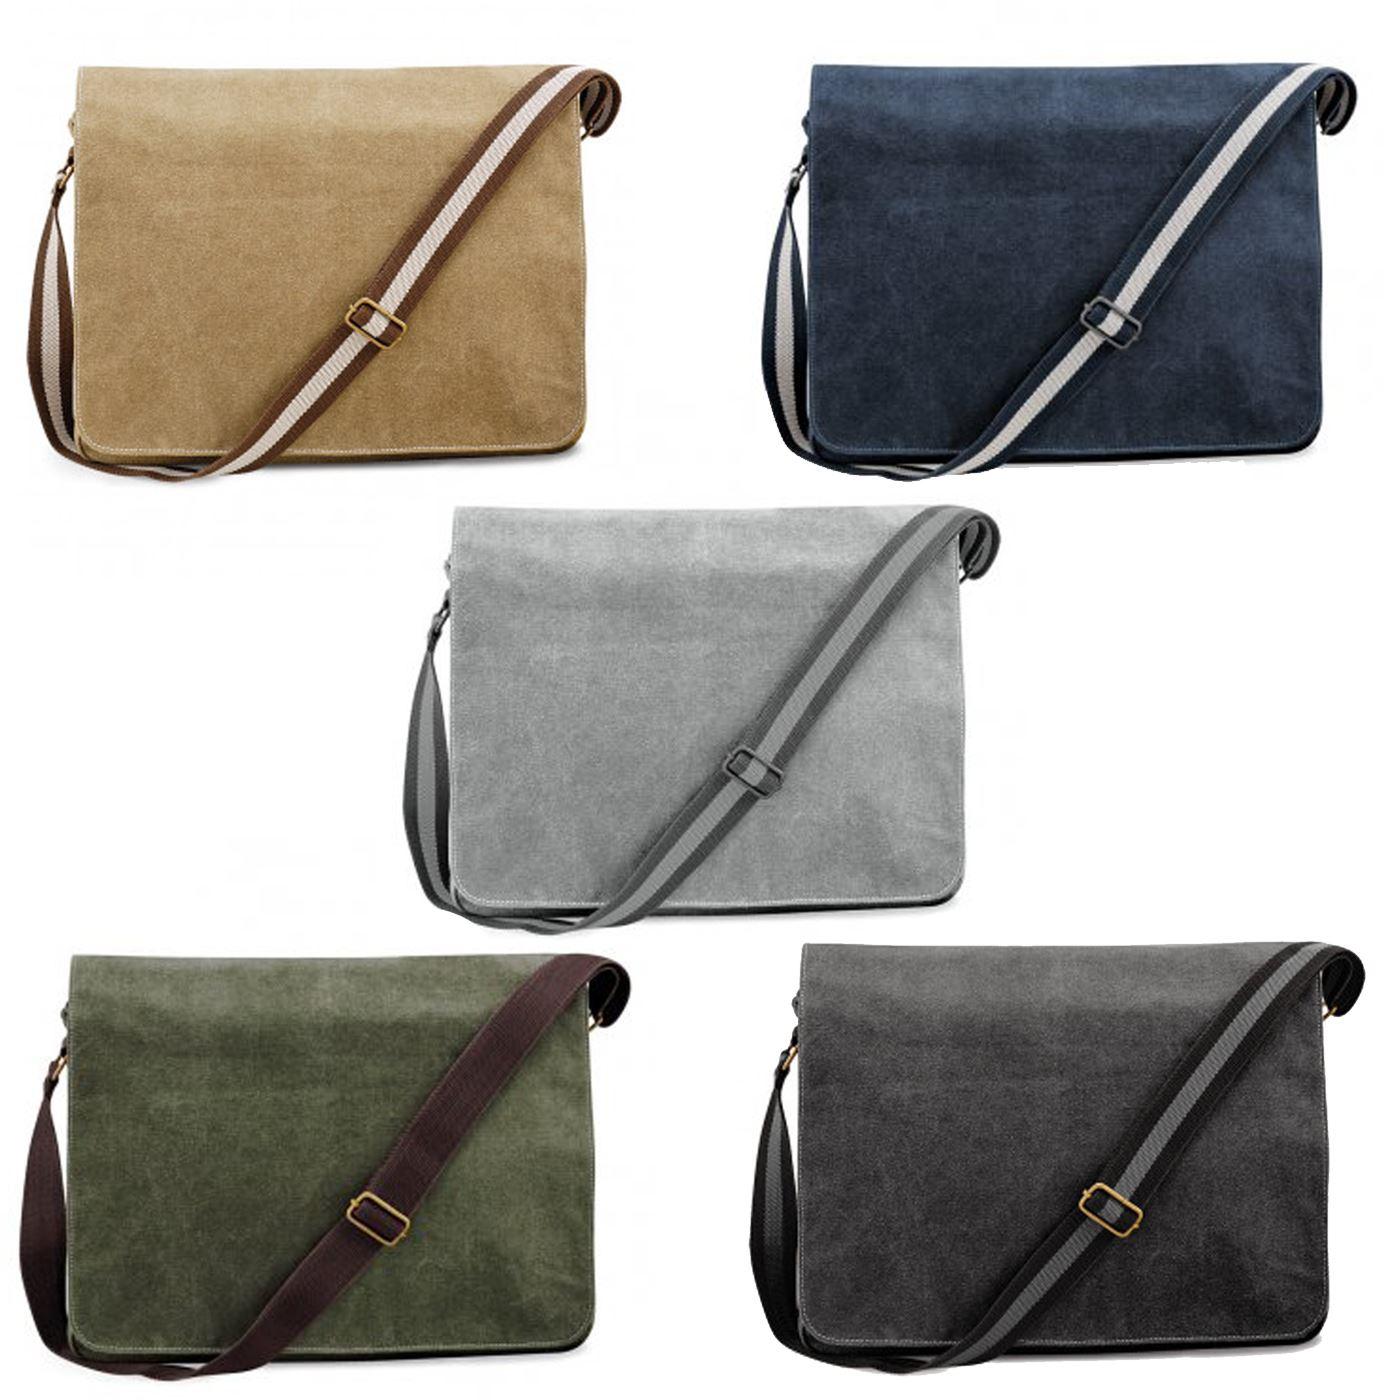 0eaa1a18f8 Details about Quadra Vintage Canvas Despatch Bag Shoulder Bag Cross Over  Laptop Messenger